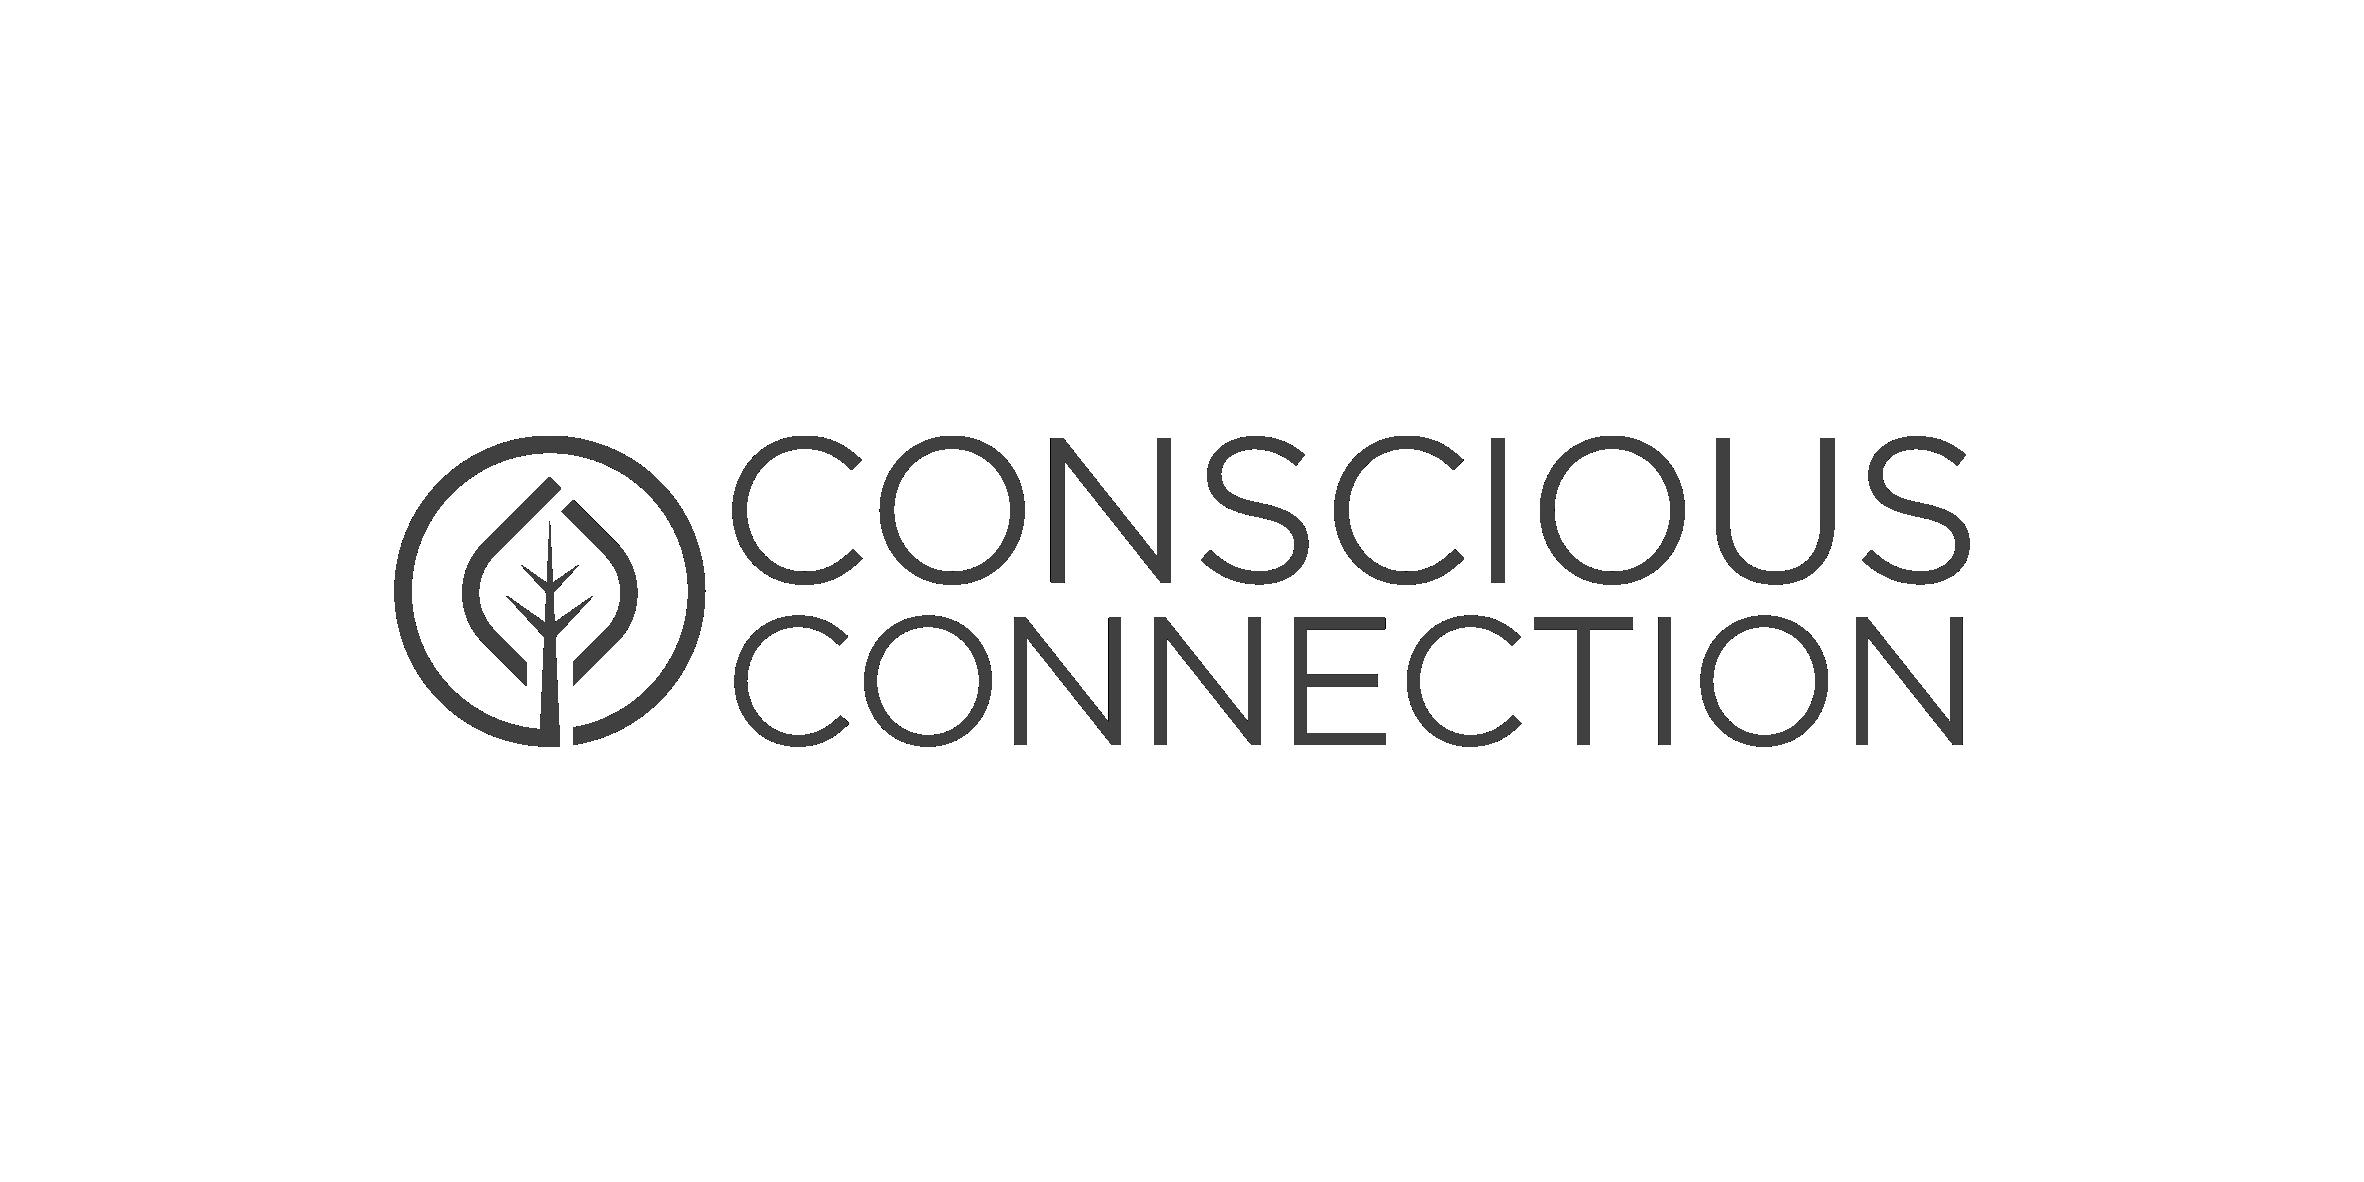 Conscious Connection Magazine needs a sleek & radically fresh logo